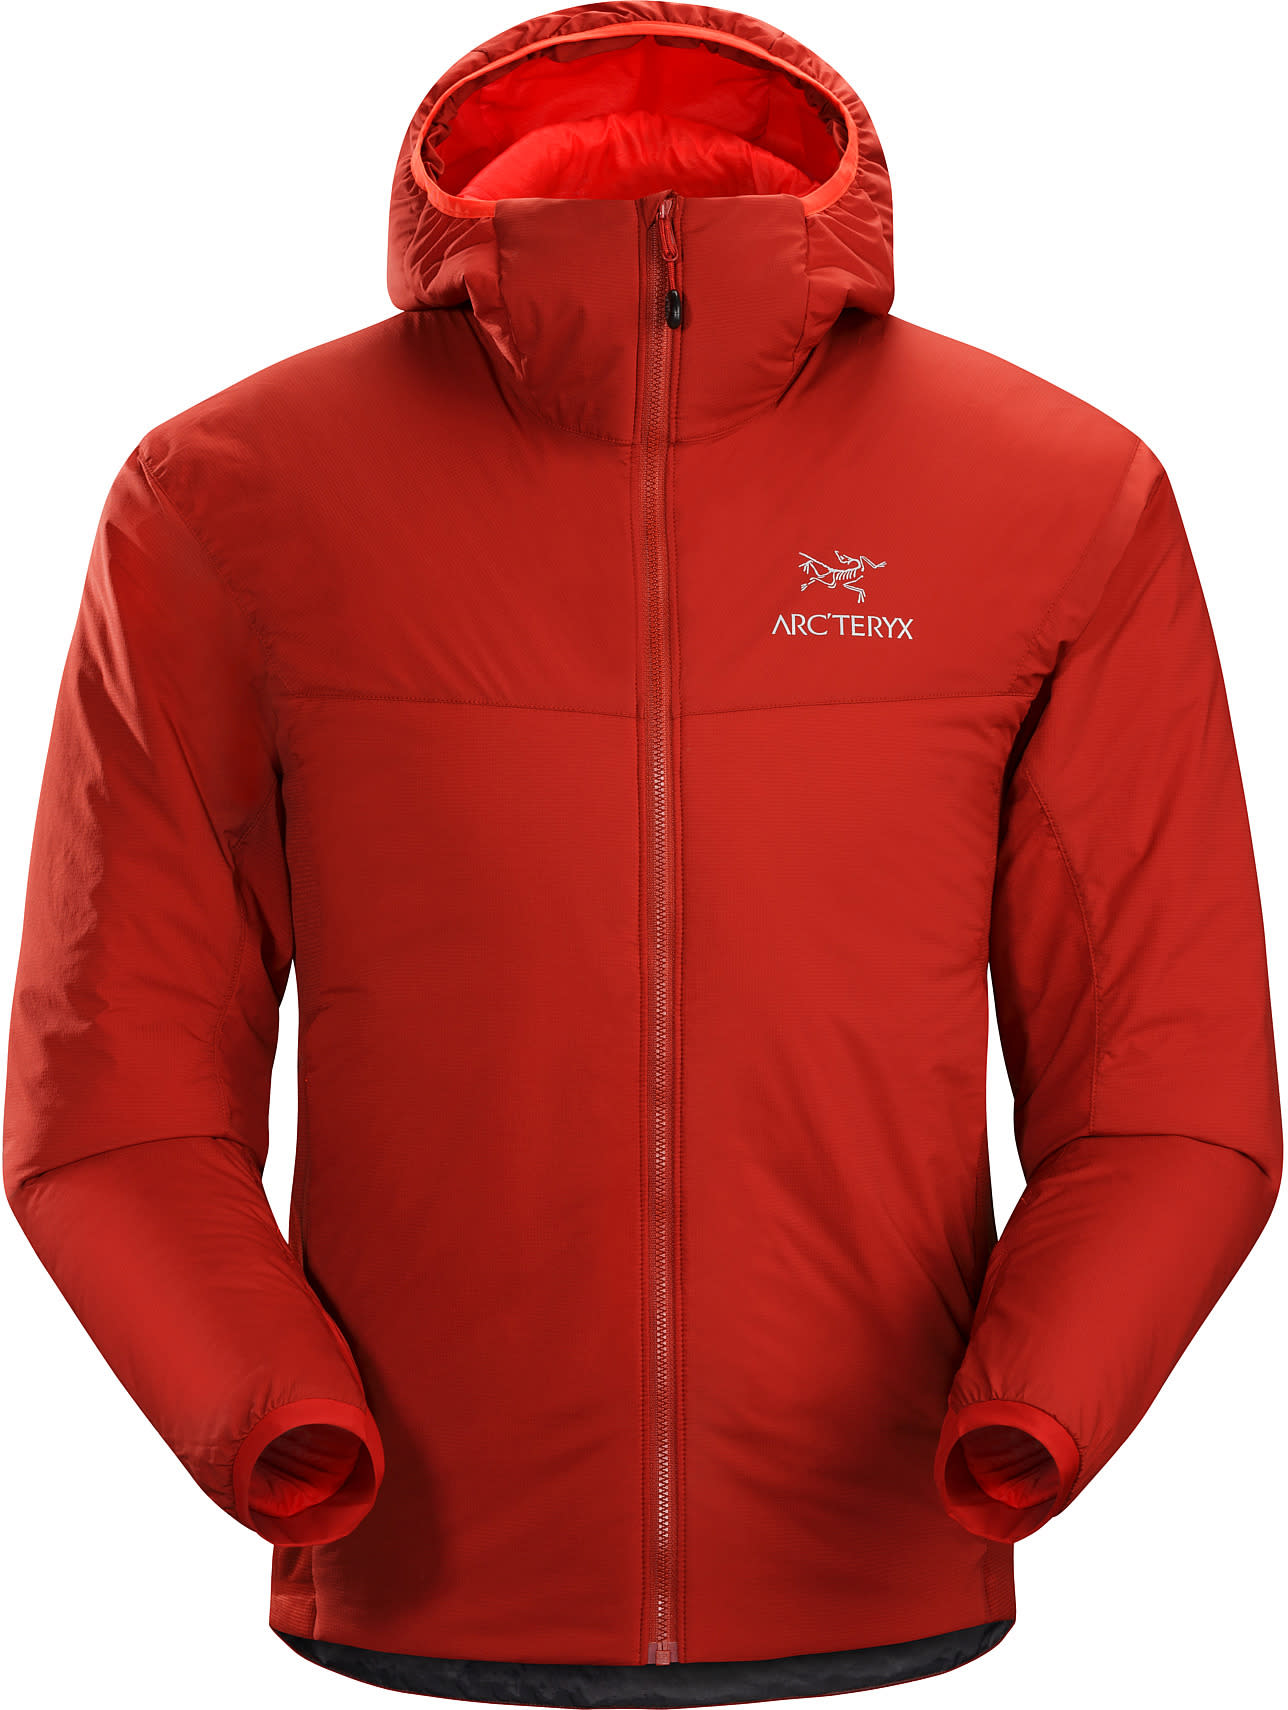 Arc'teryx Atom LT Hoody Ski Jacket ac3atlh06pi18zz-arcteryx-ski-jackets